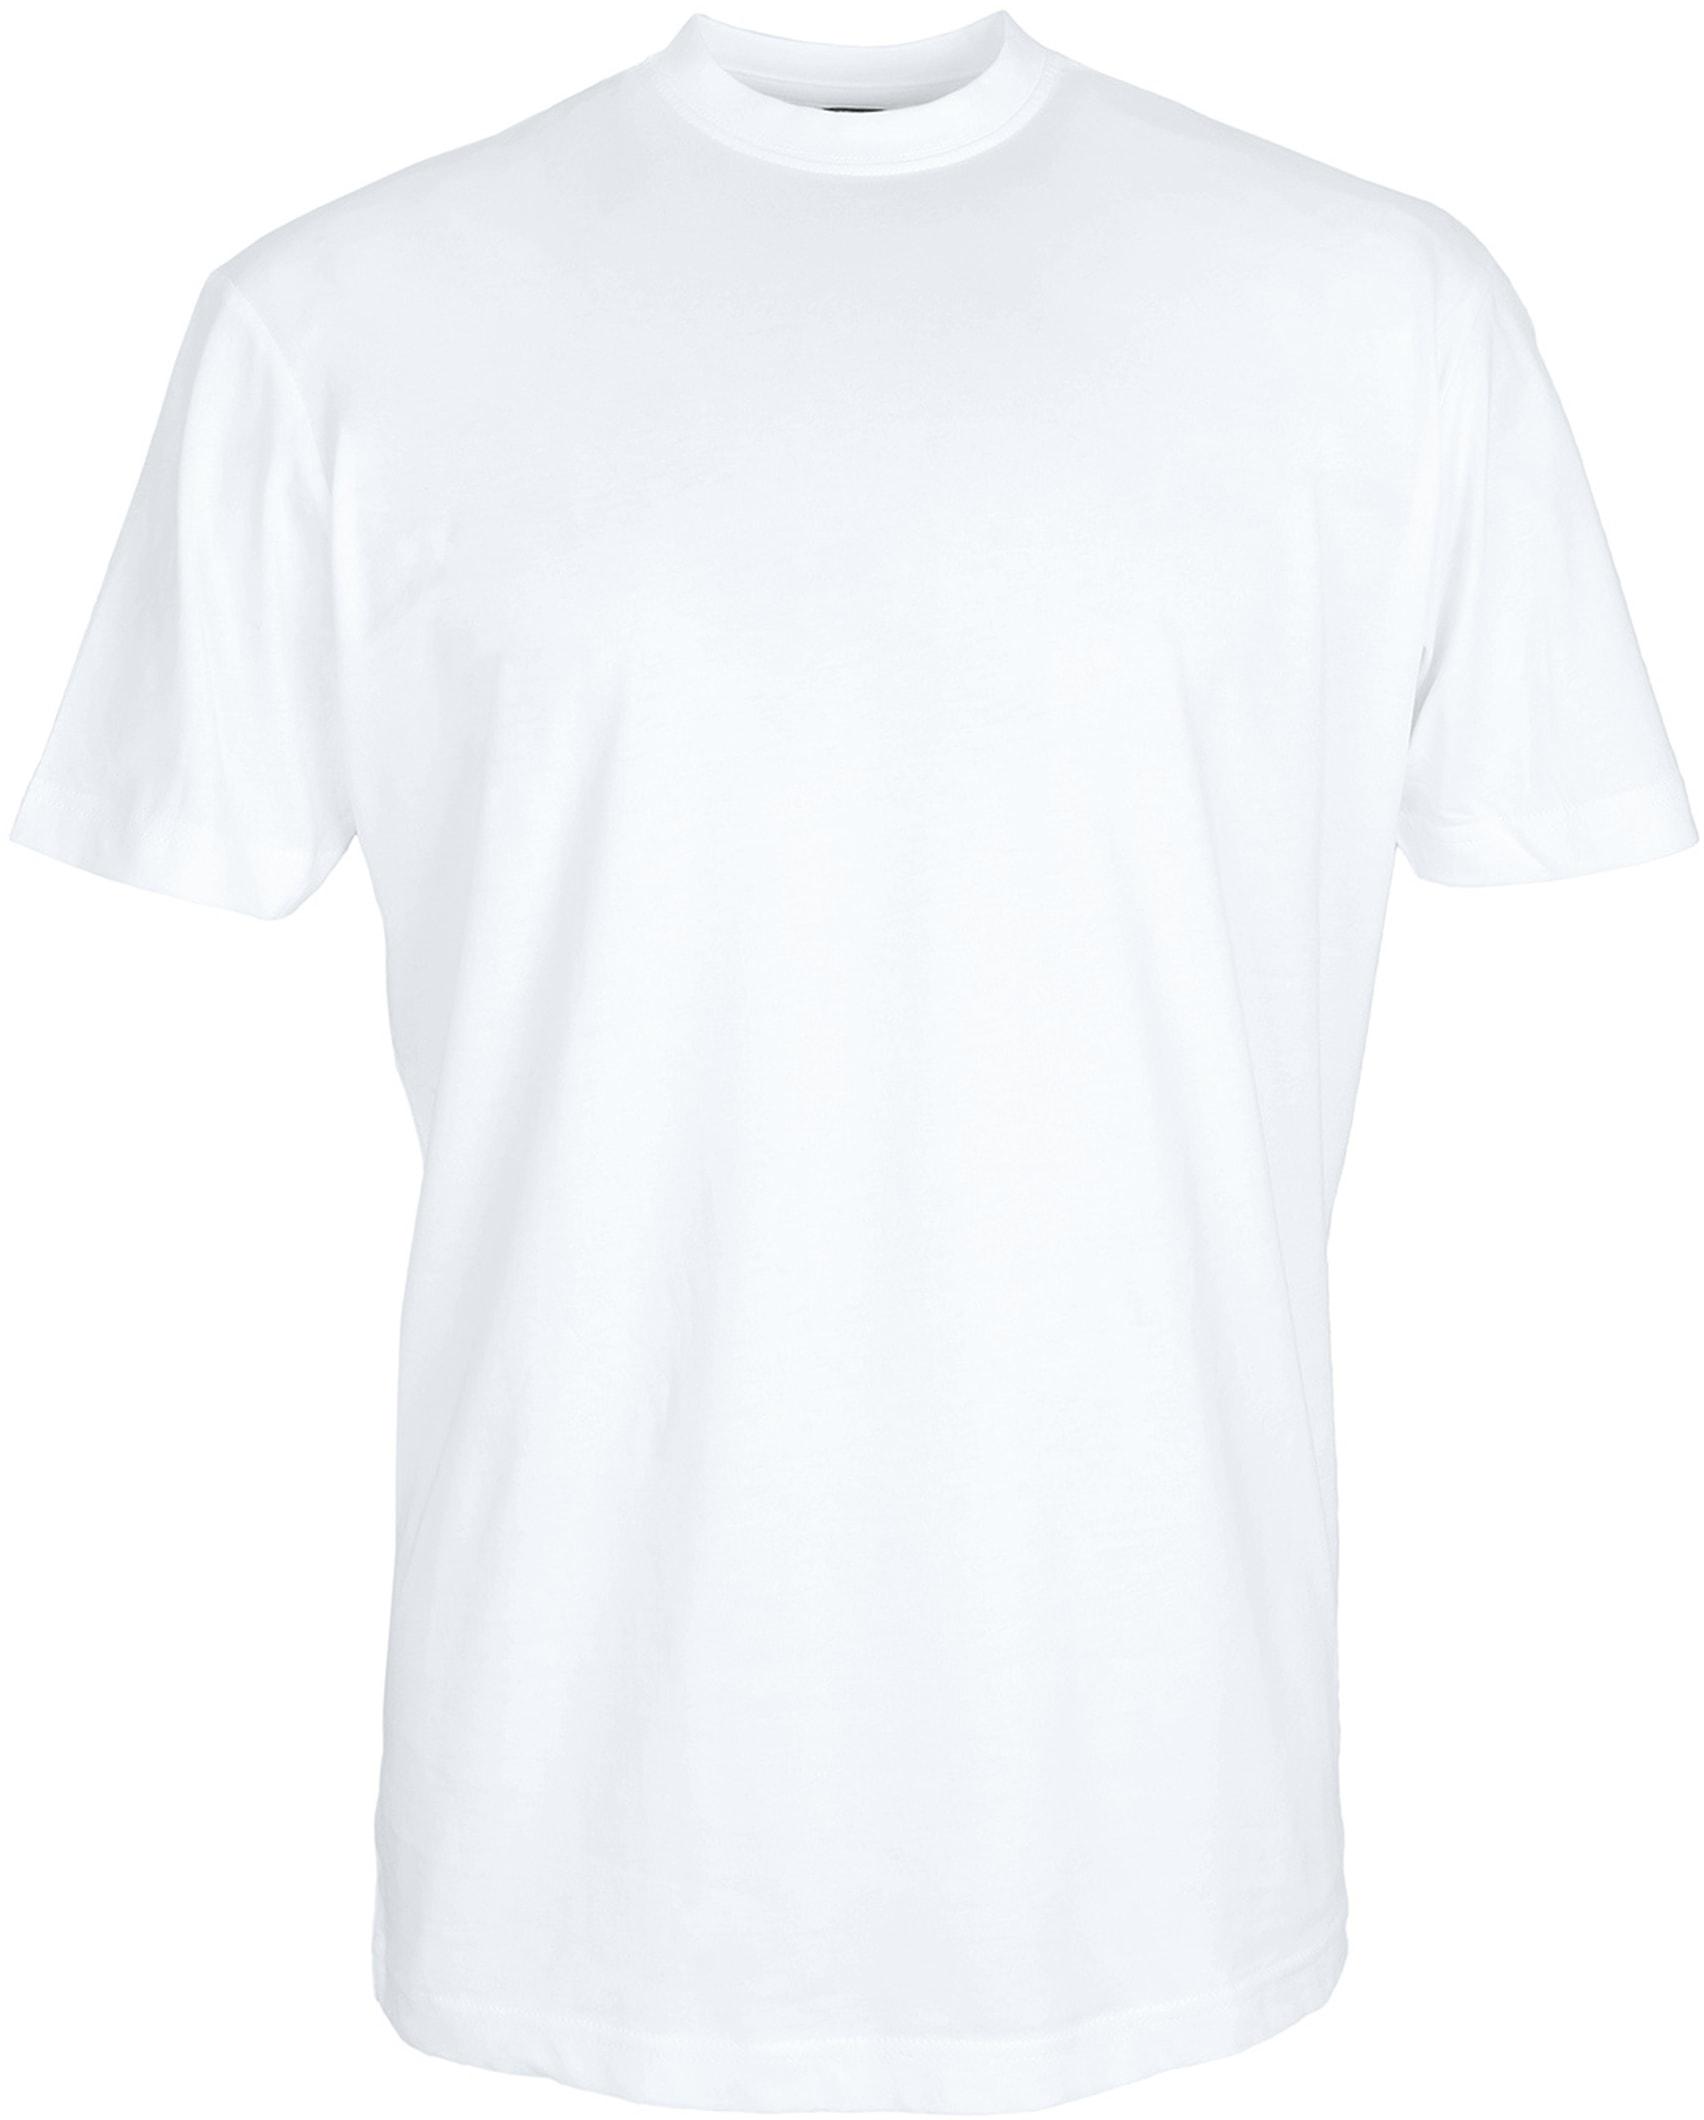 T-shirt Brede Ronde Hals 6-Pack (6 stuks) foto 1